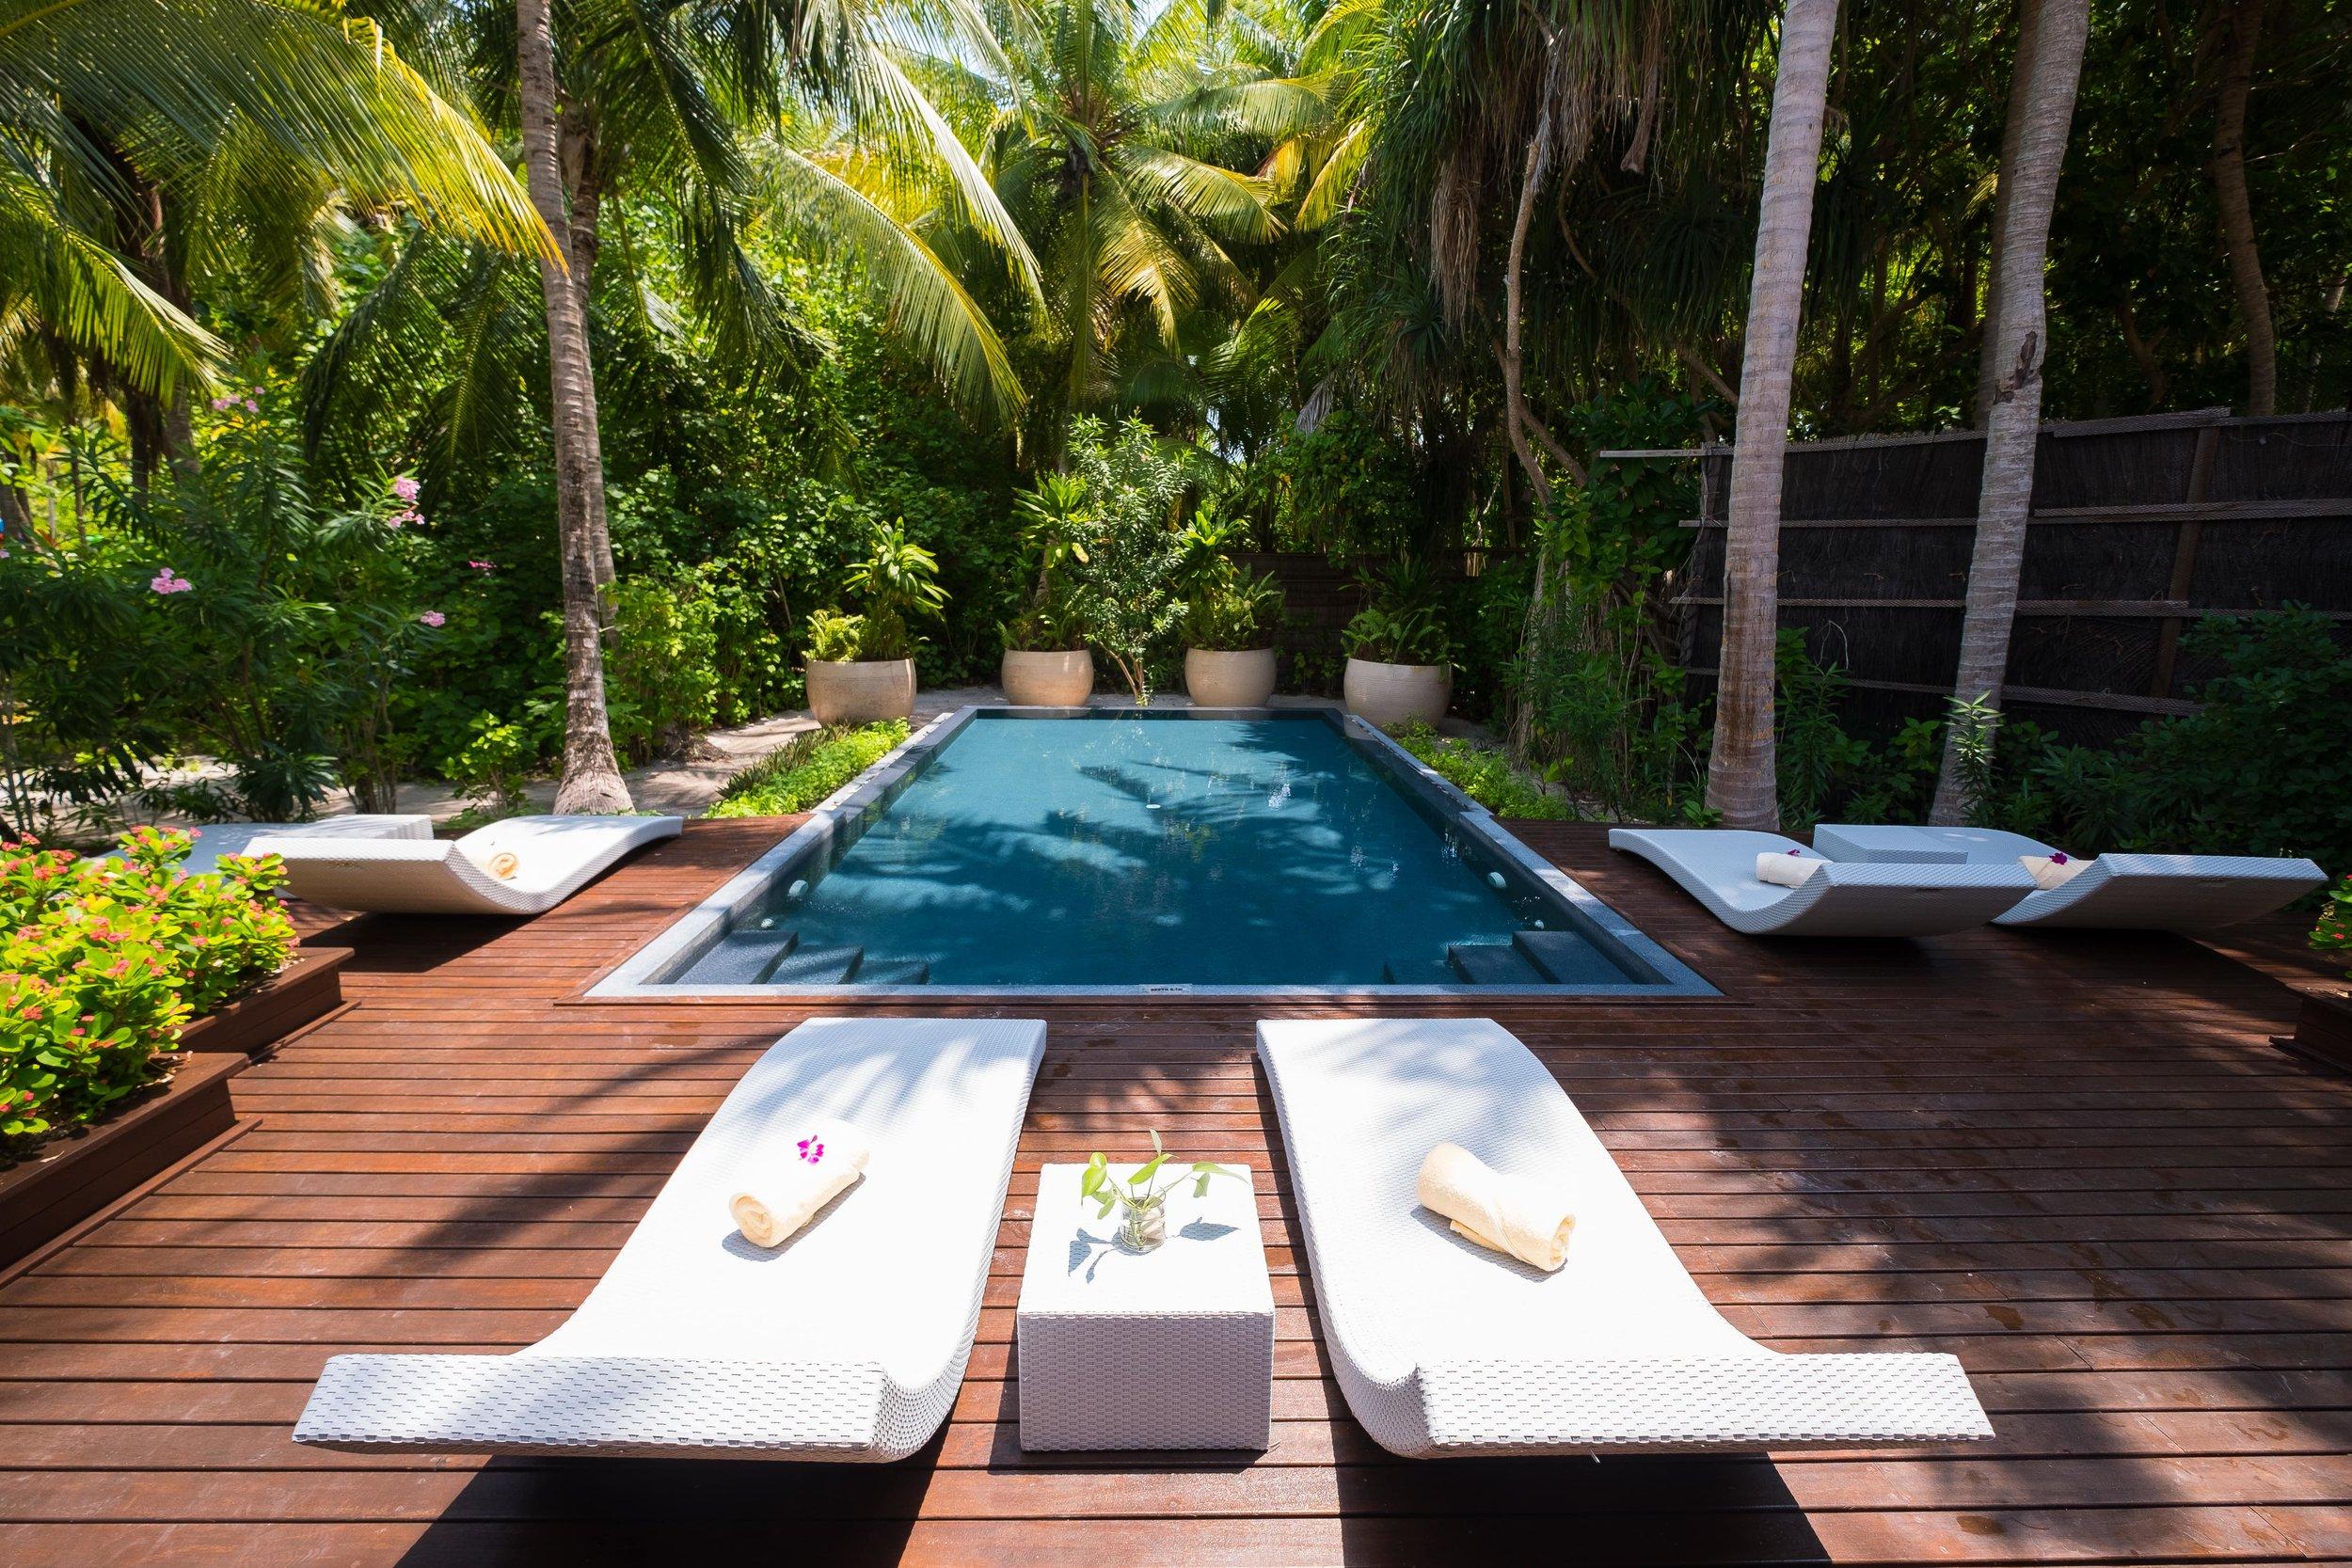 Luxury 5 Star Resort In The Maldives Dusit Thani Maldives